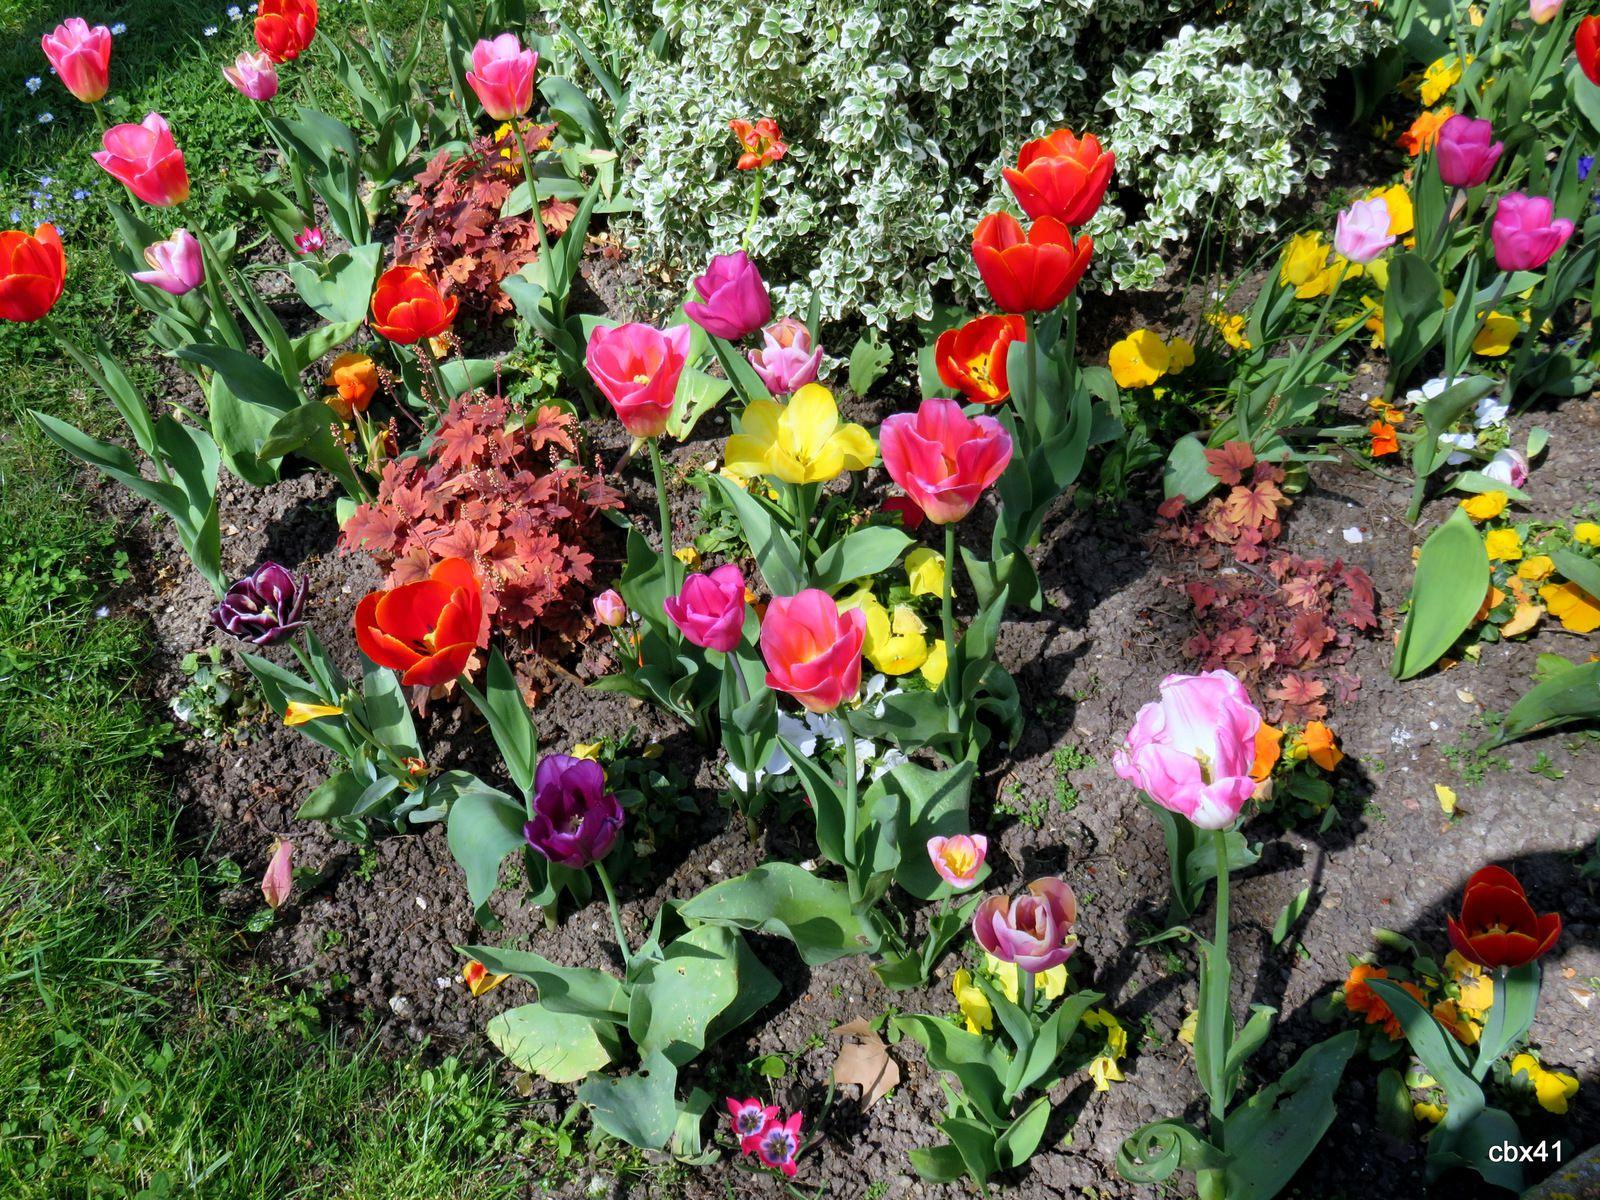 Les tulipes de ma résidence